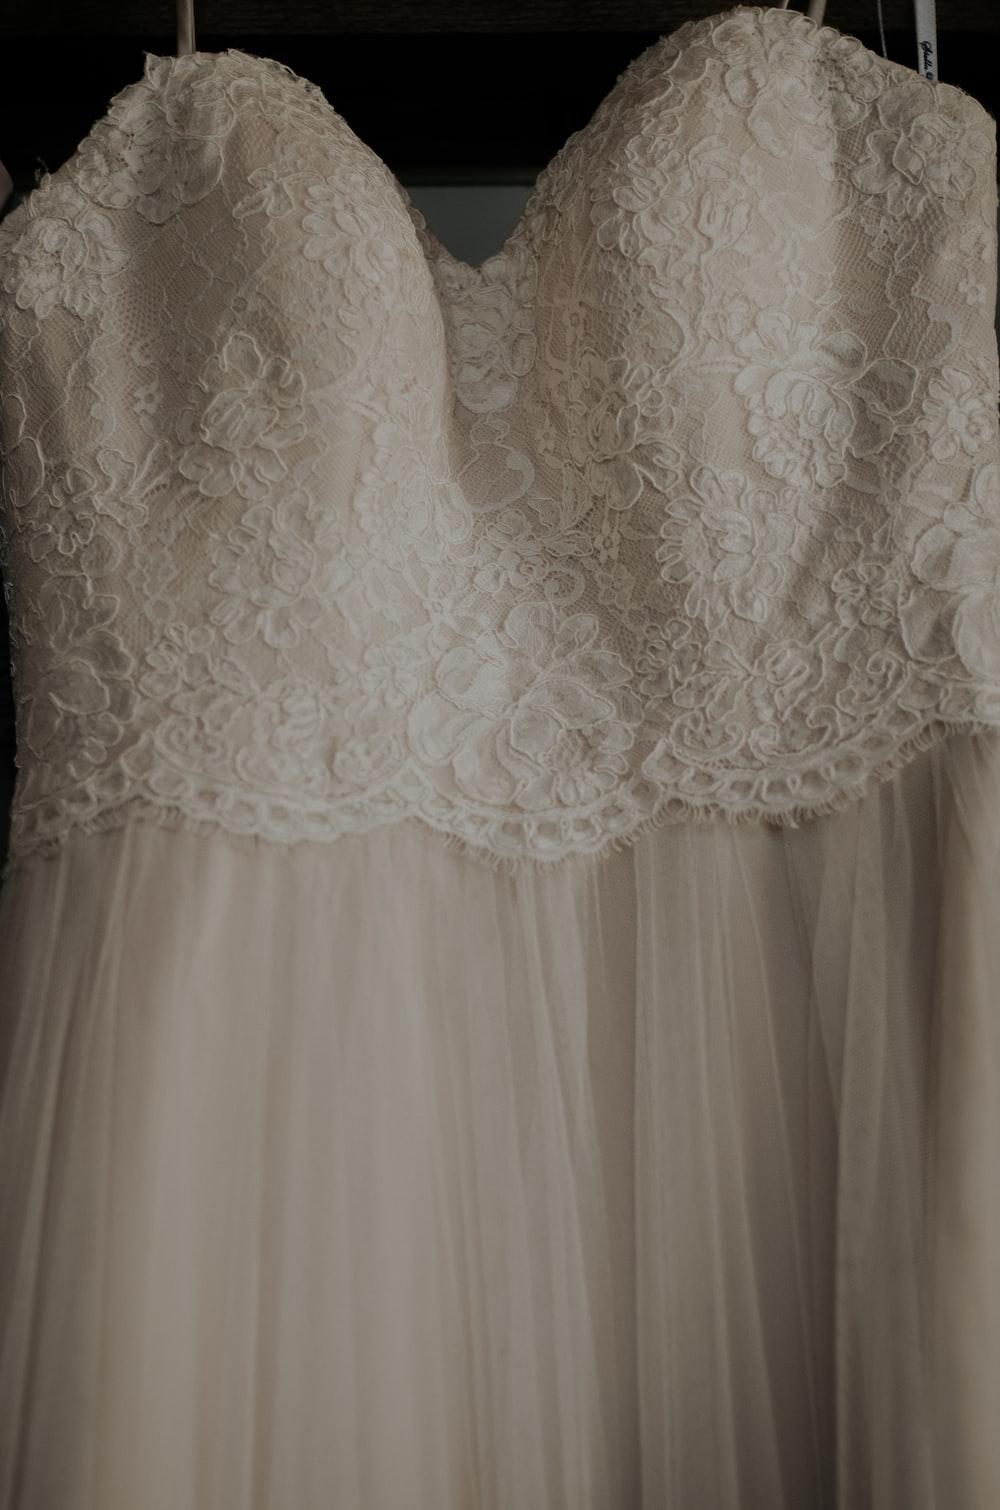 white lace spaghetti strap dress